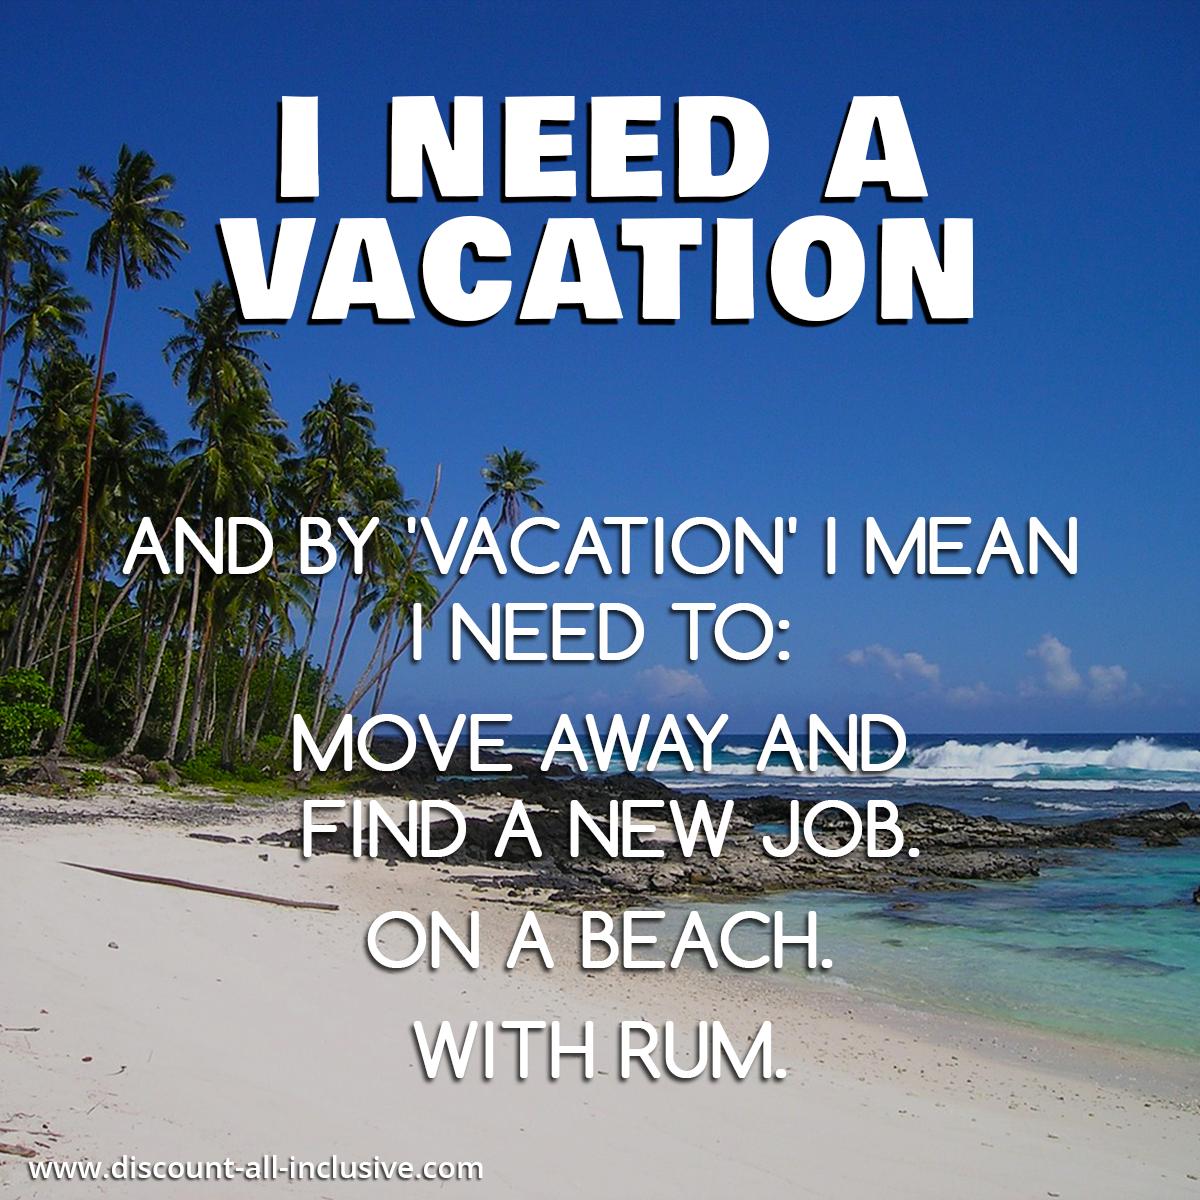 i need a vacation and by vacation i mean i need to move away and i need a vacation and by vacation i mean i need to move away